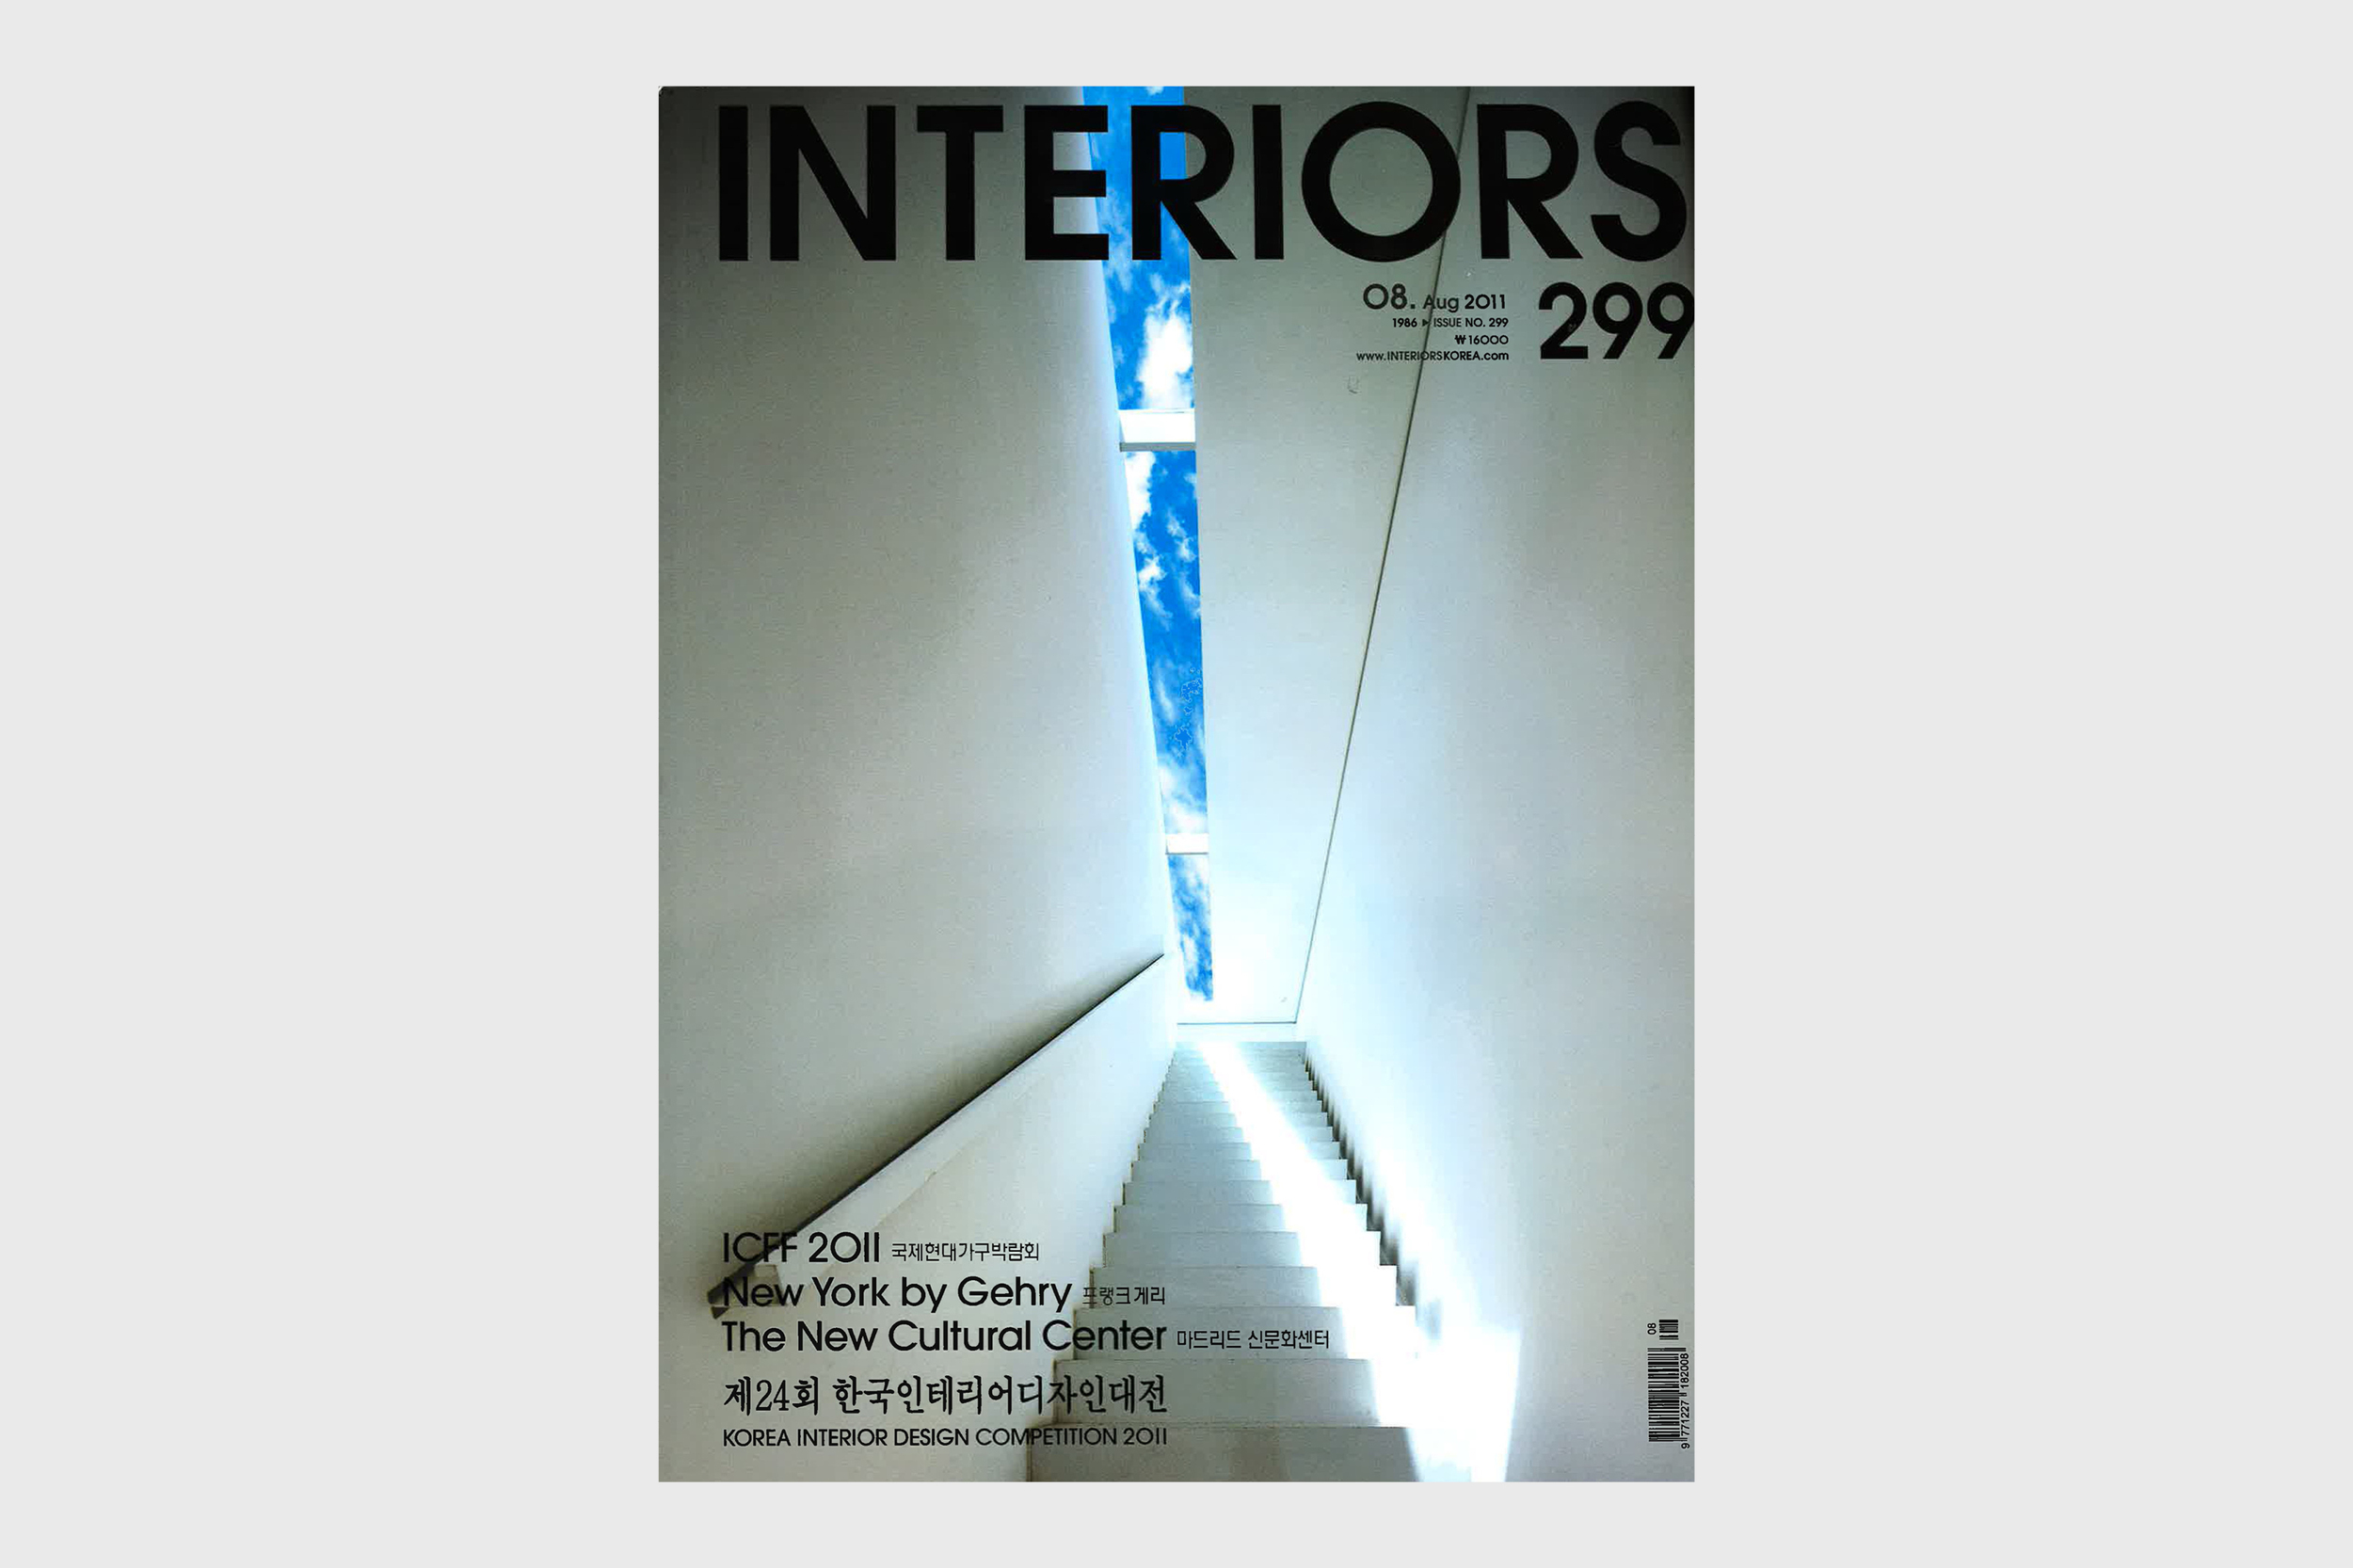 knof-press--interiors--2011-08_01.jpg